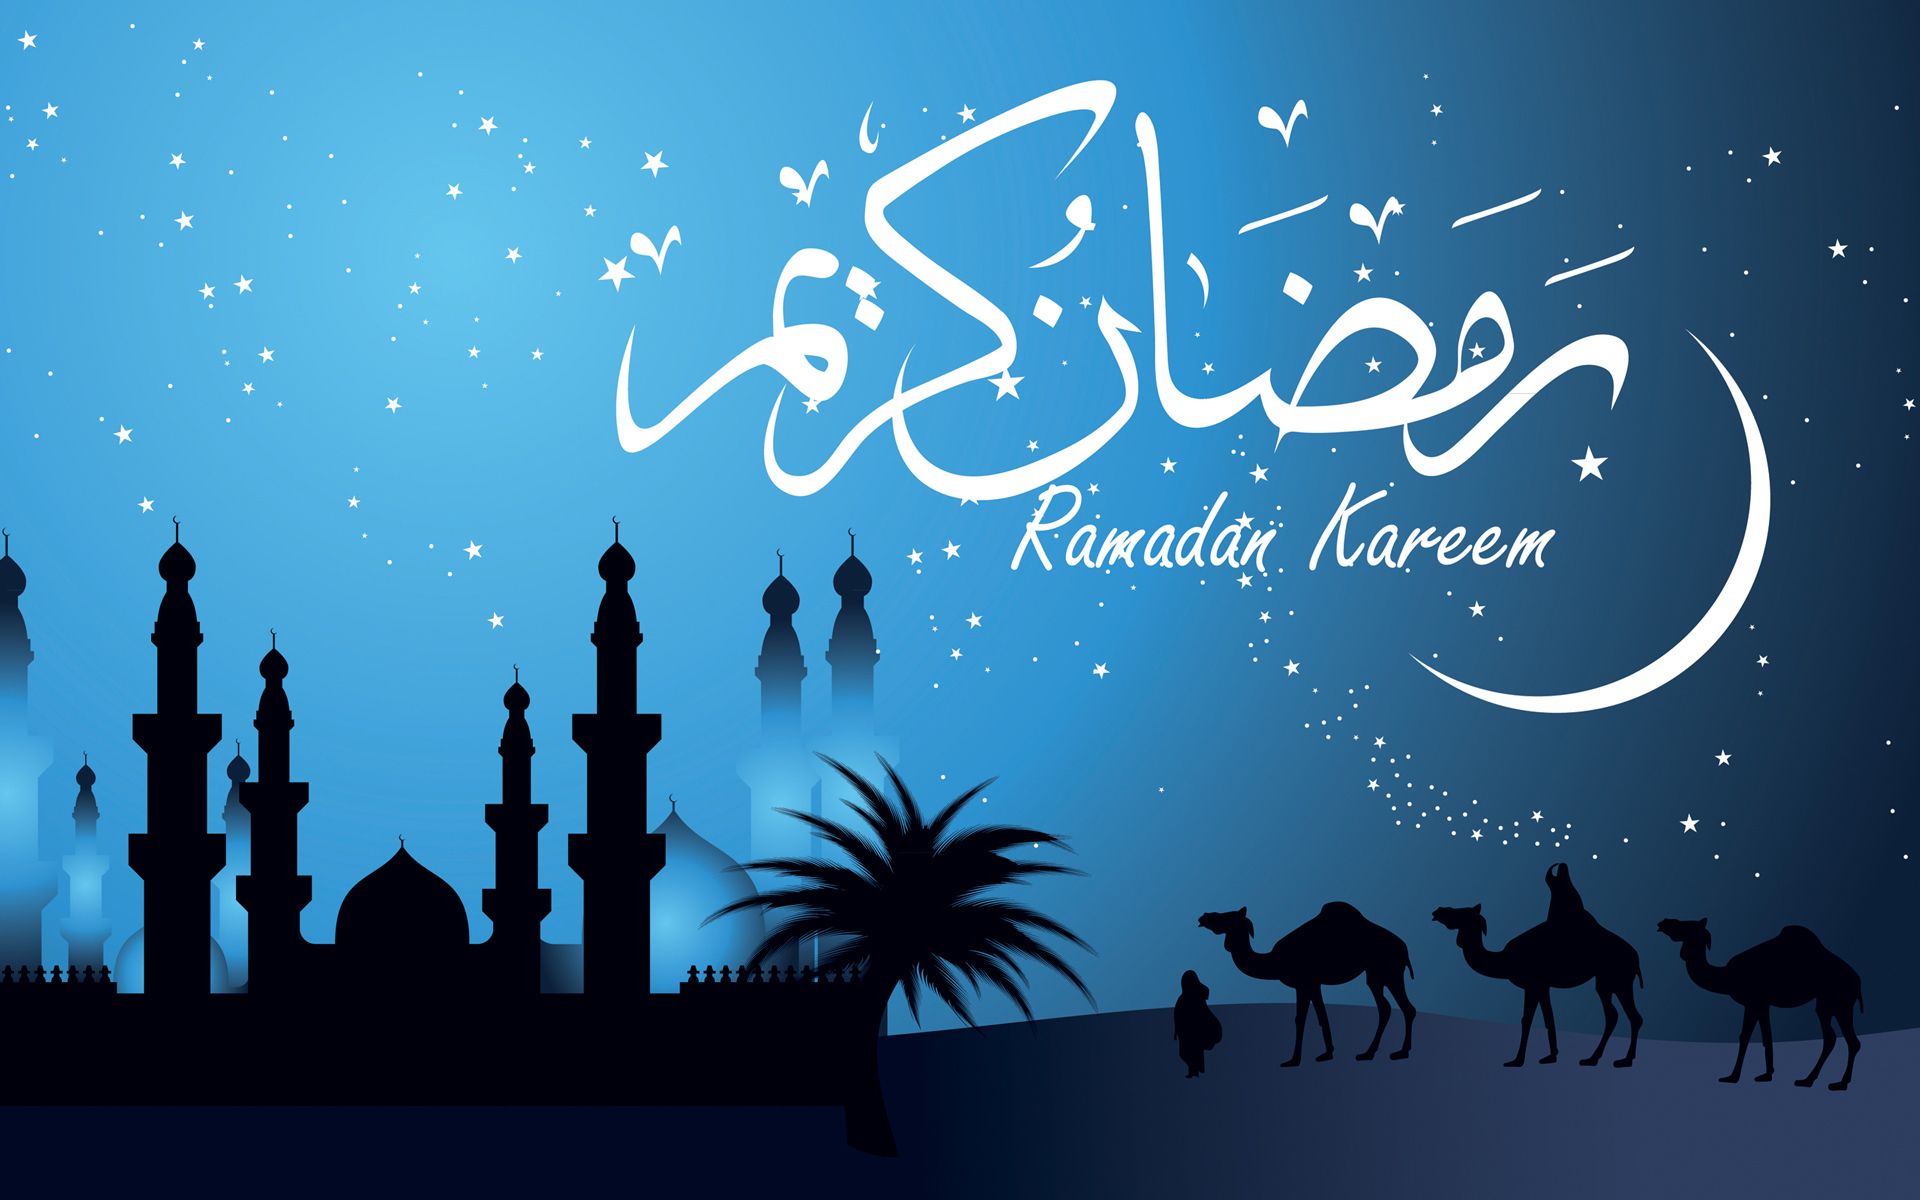 Открытка с днем рамадан